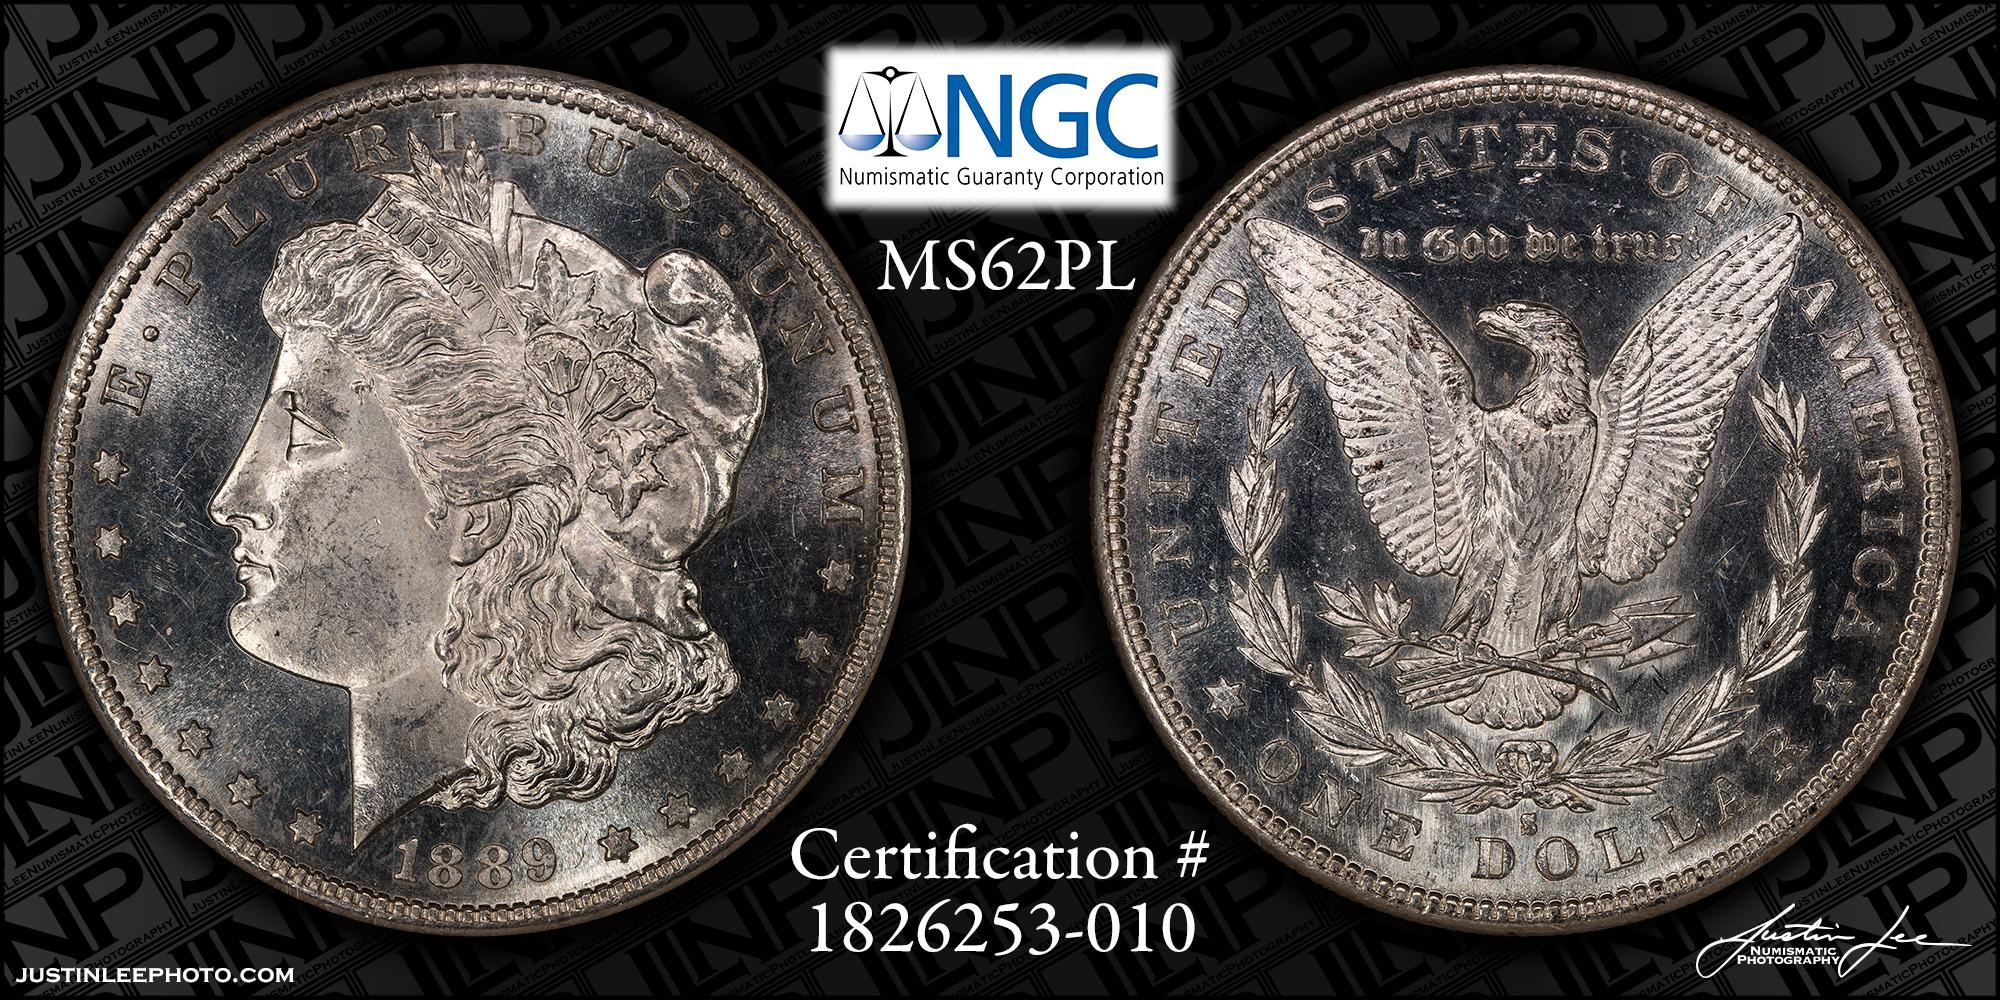 1889-S Morgan Dollar NGC MS62PL